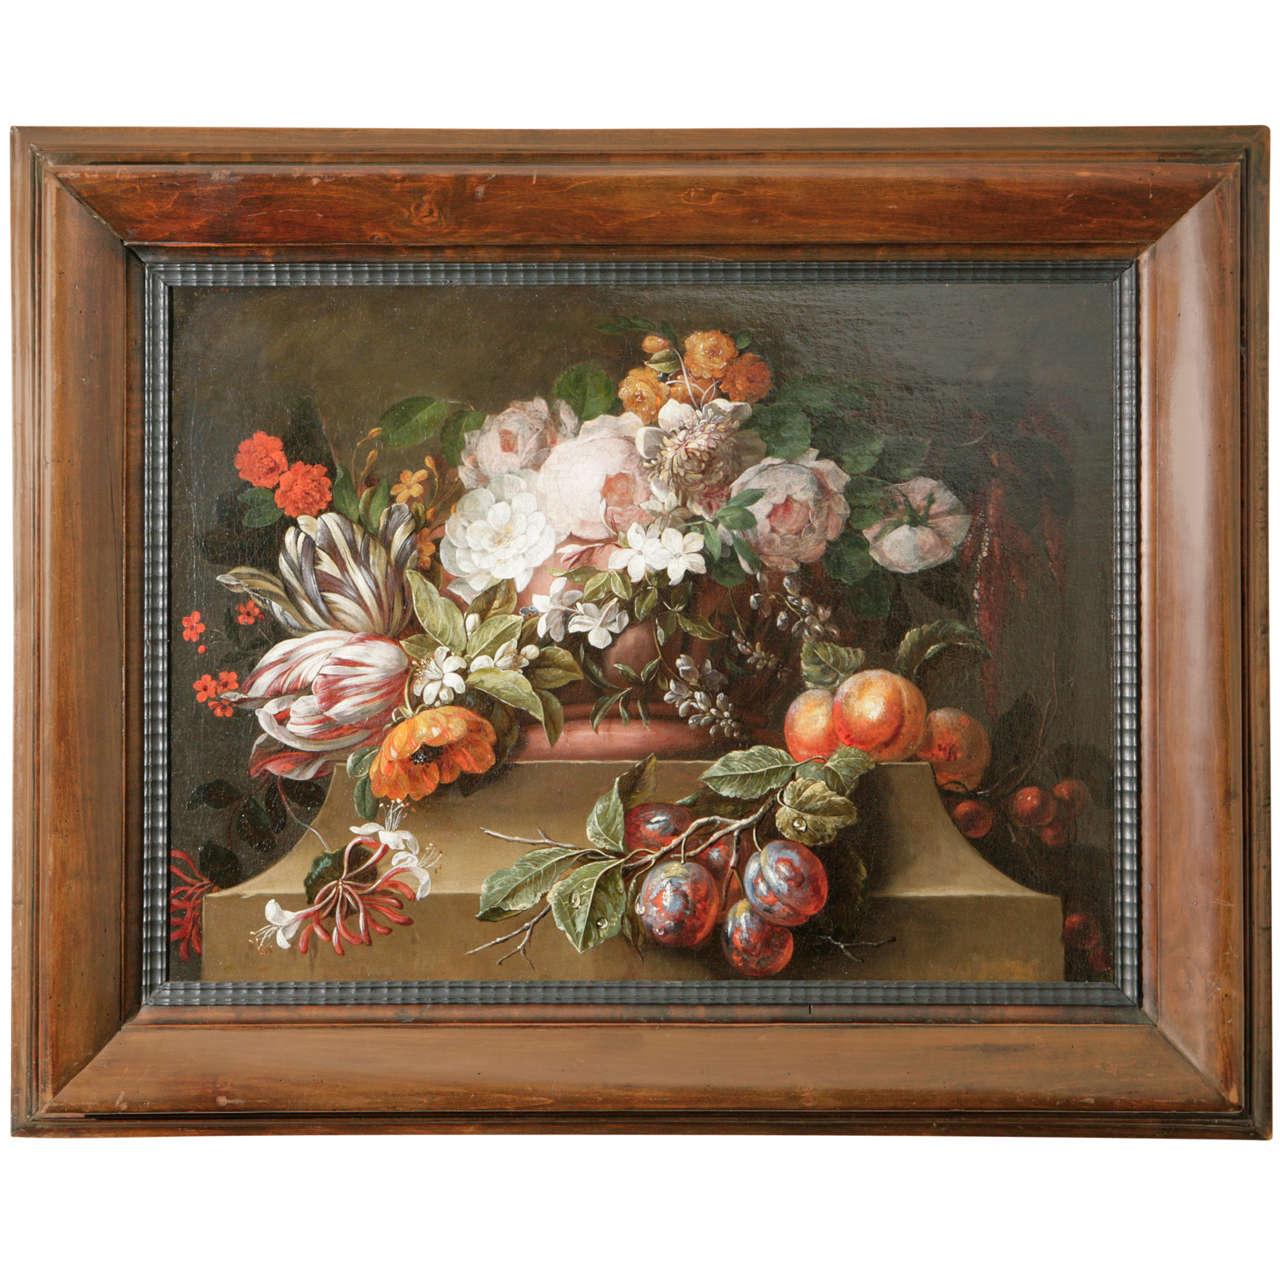 18th Century Dutch Still Life Oil Painting